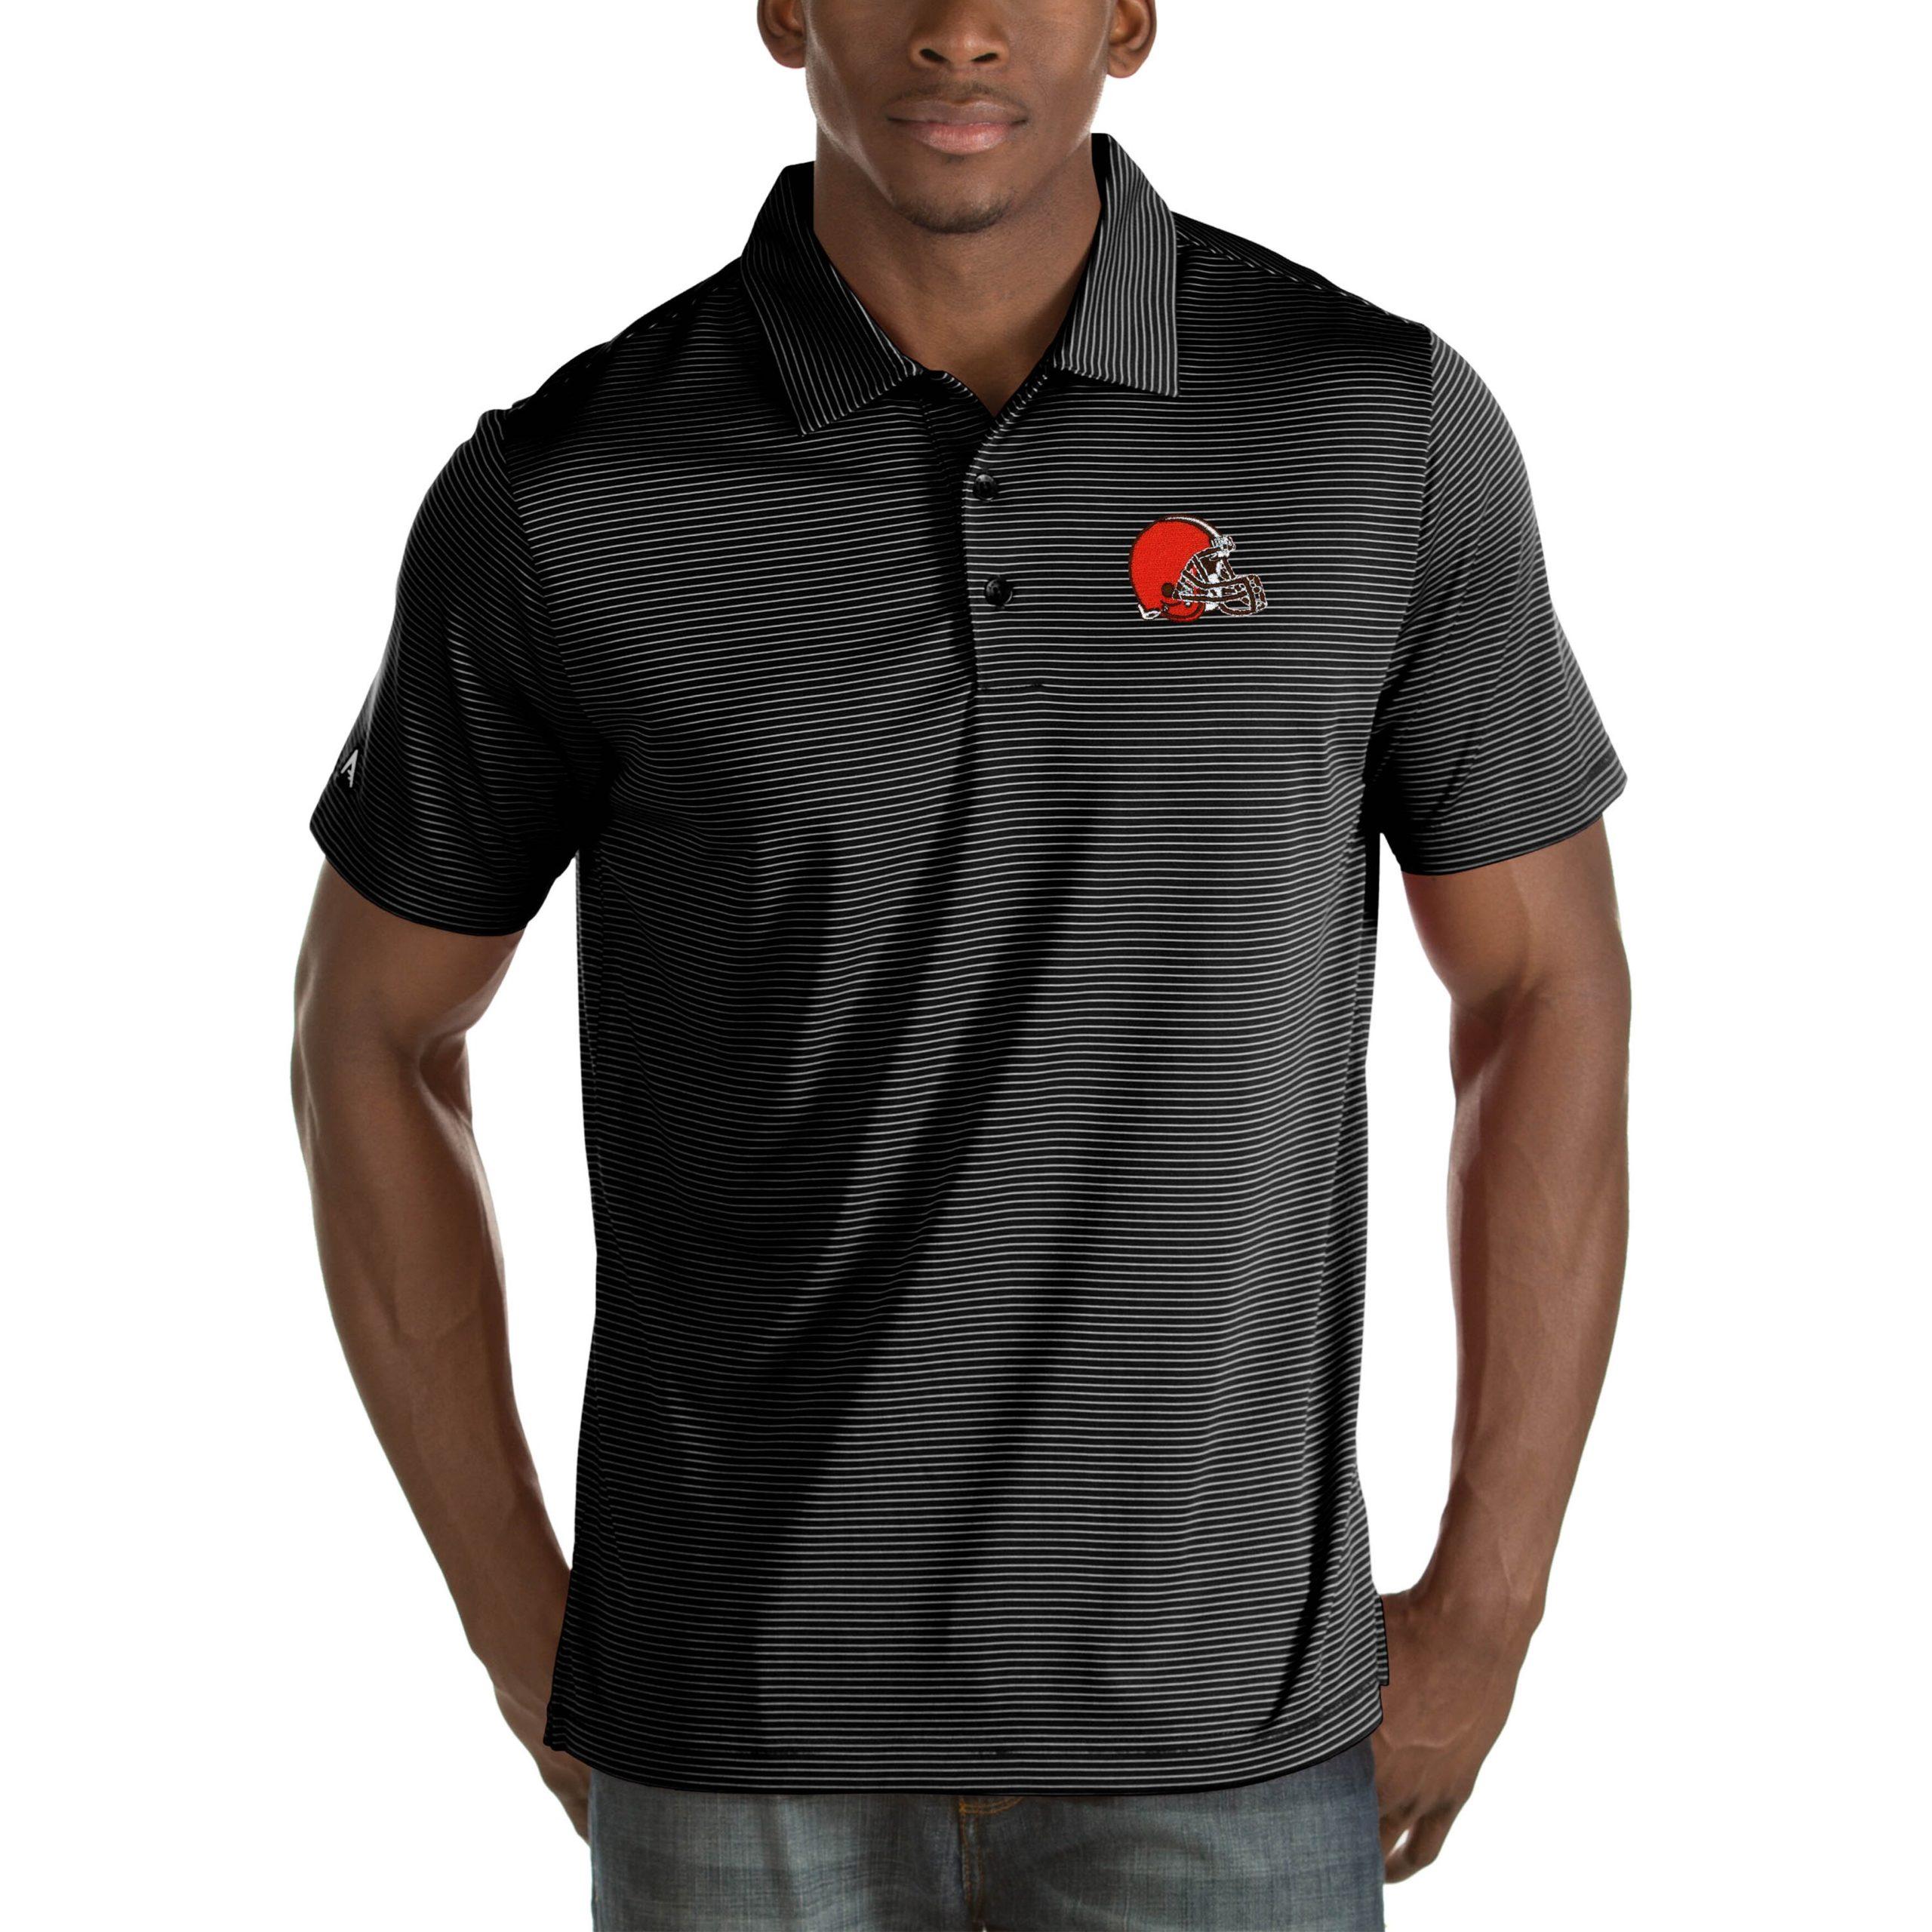 Cleveland Browns Antigua Quest Big & Tall Polo - Black